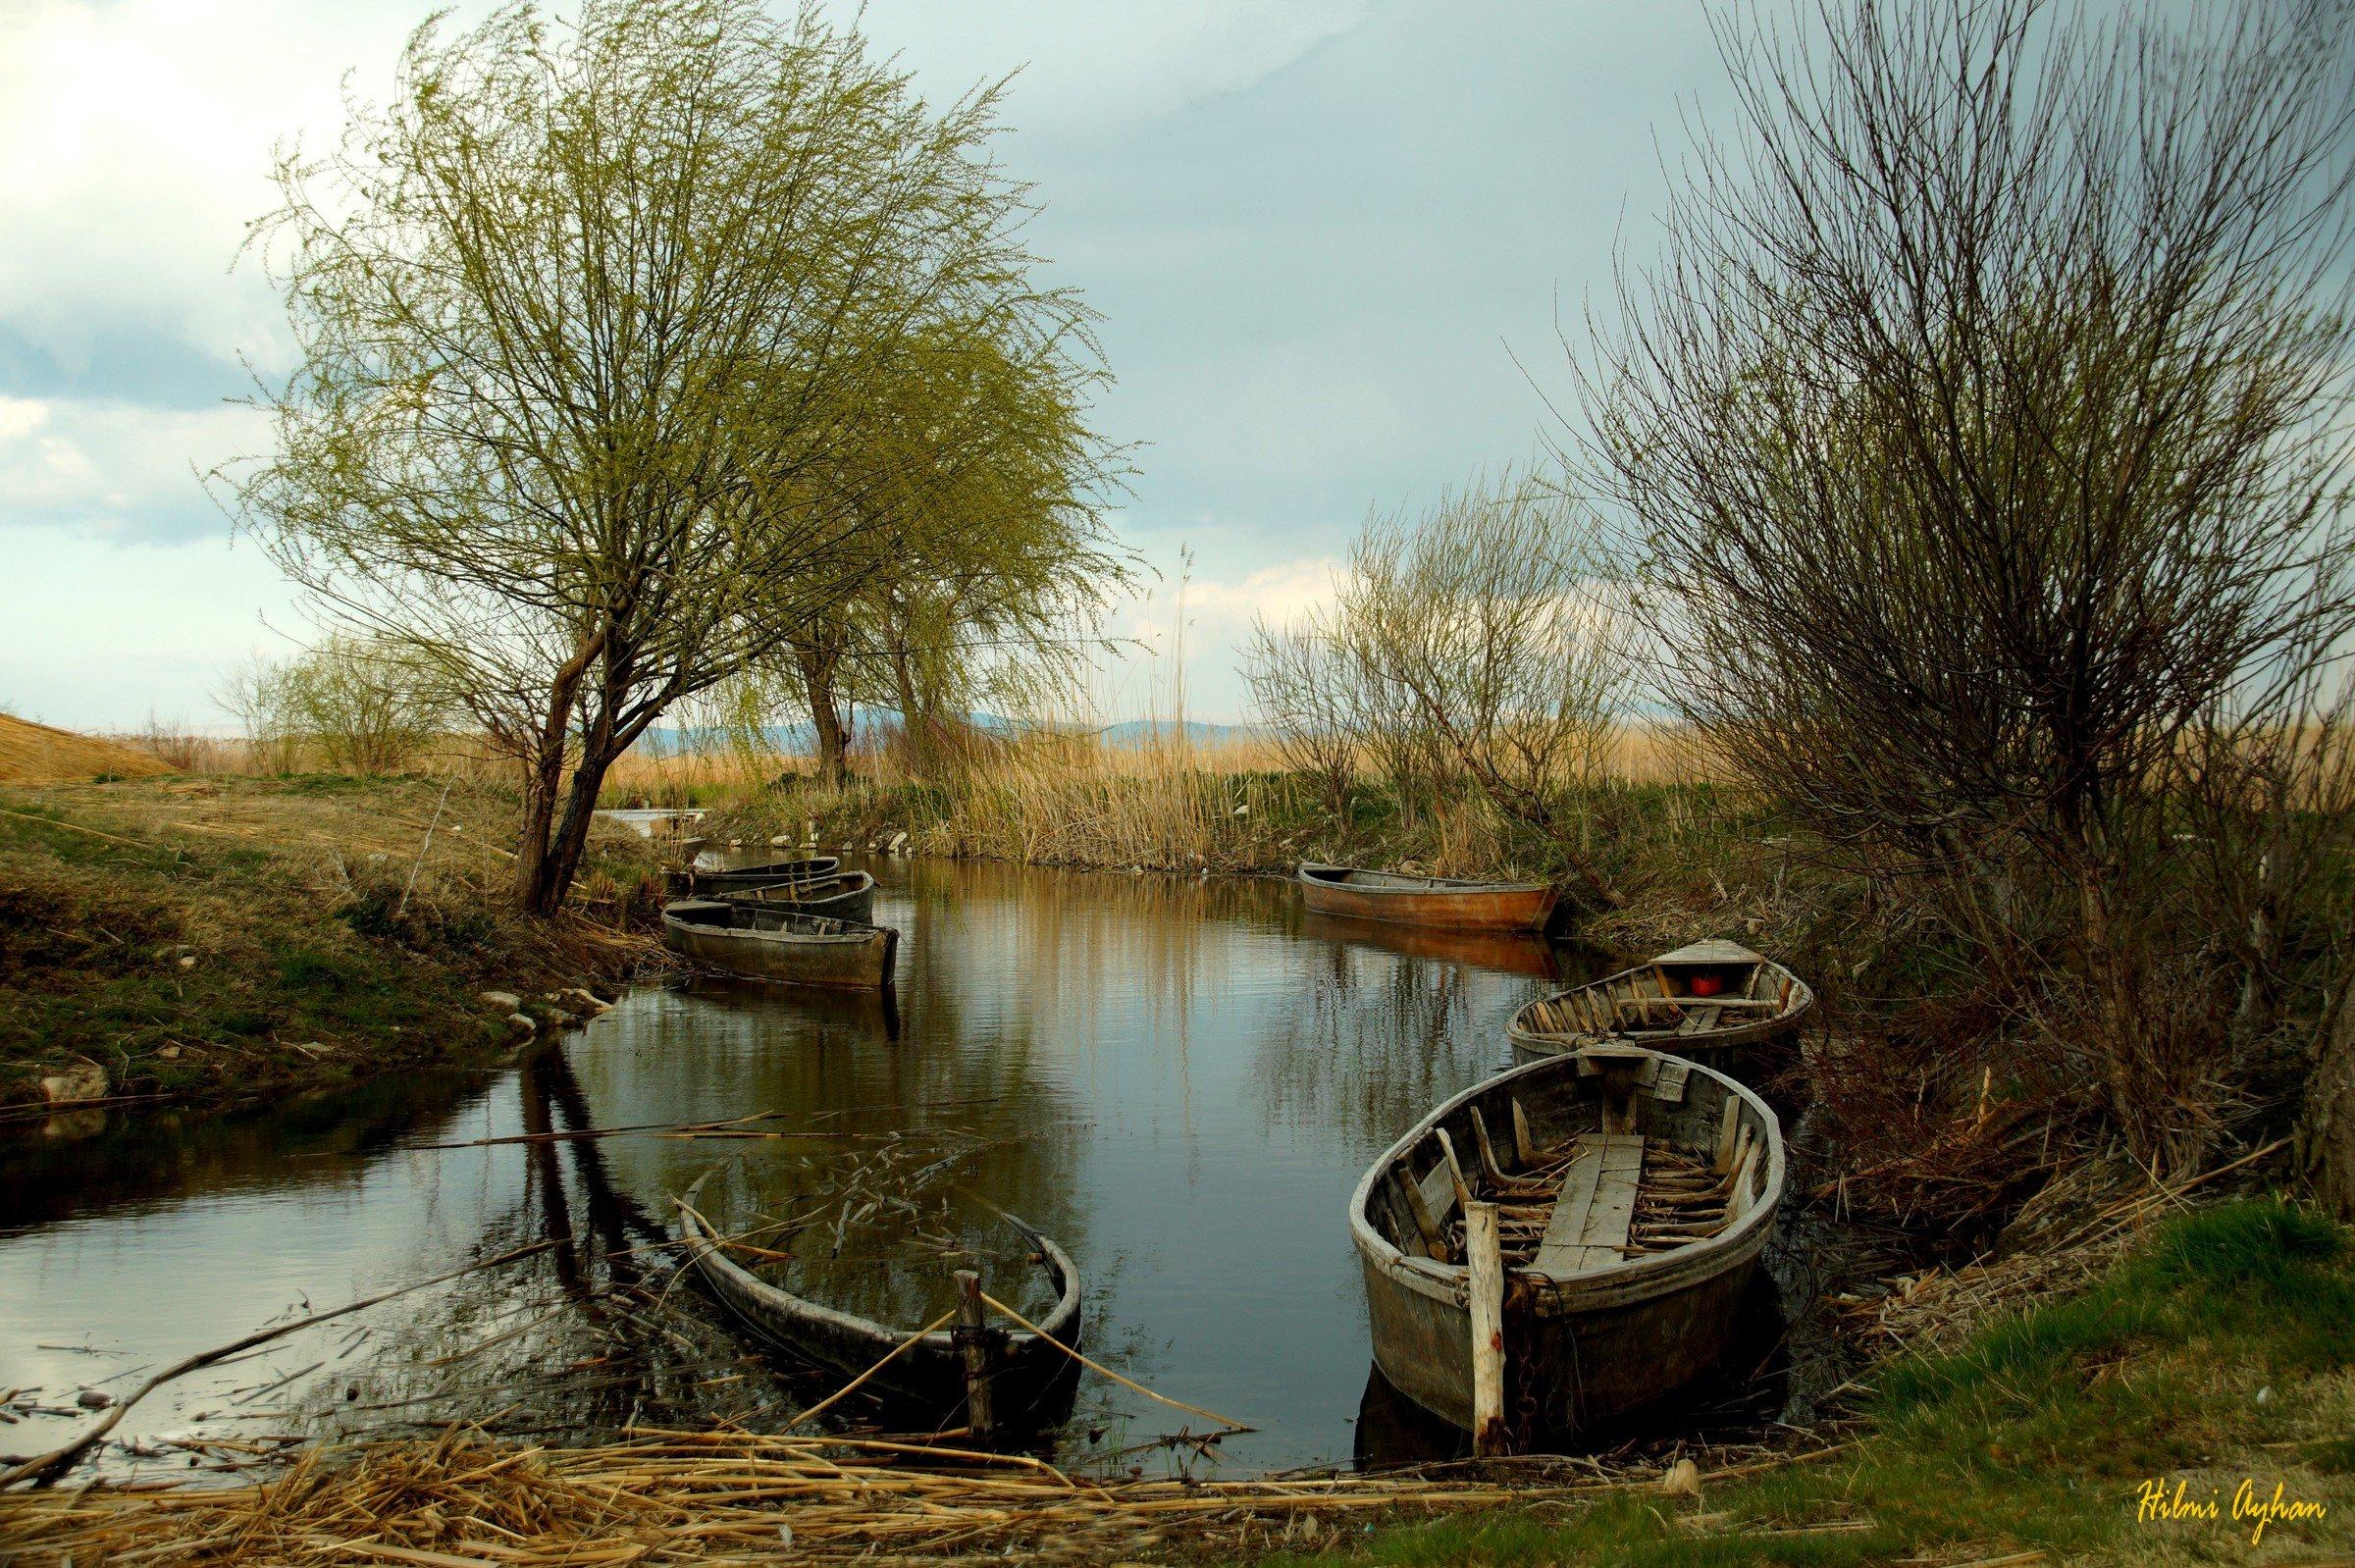 Eber Lake, Hilmi